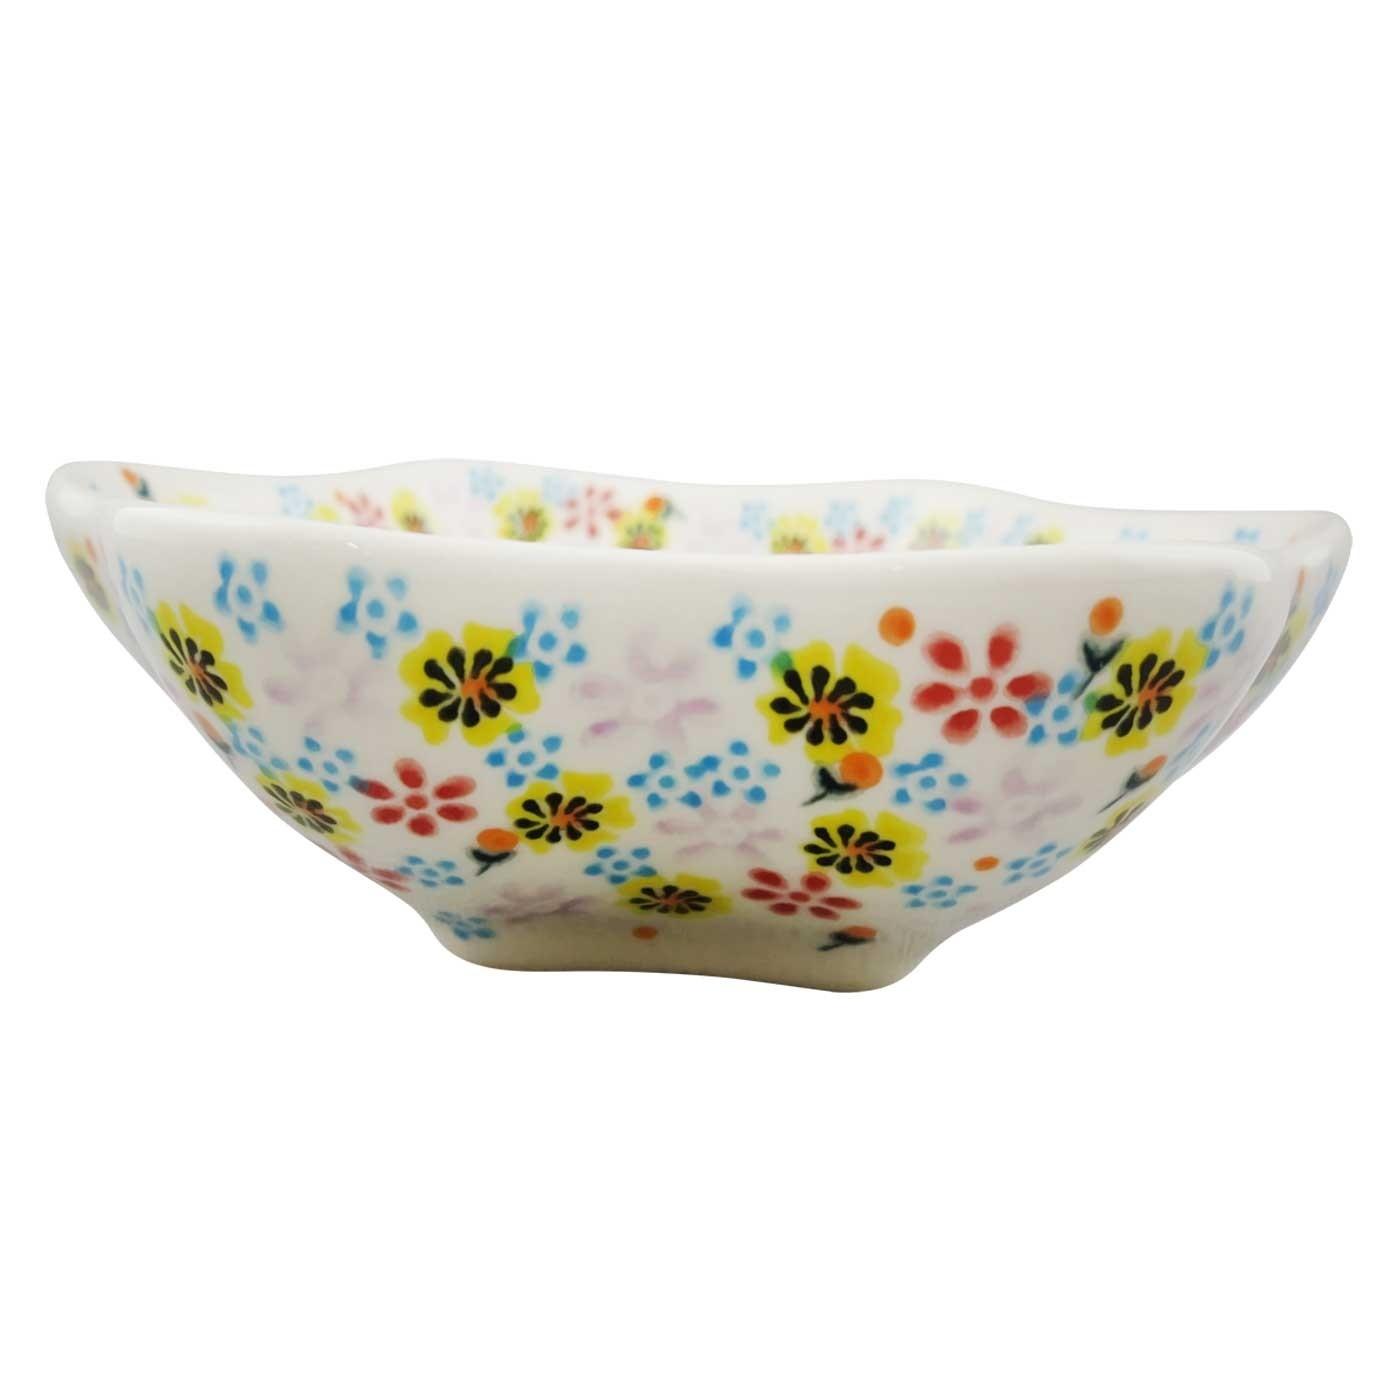 Pottery Avenue Stoneware Boho Bowl (LG) - V447-C115 Harmonious